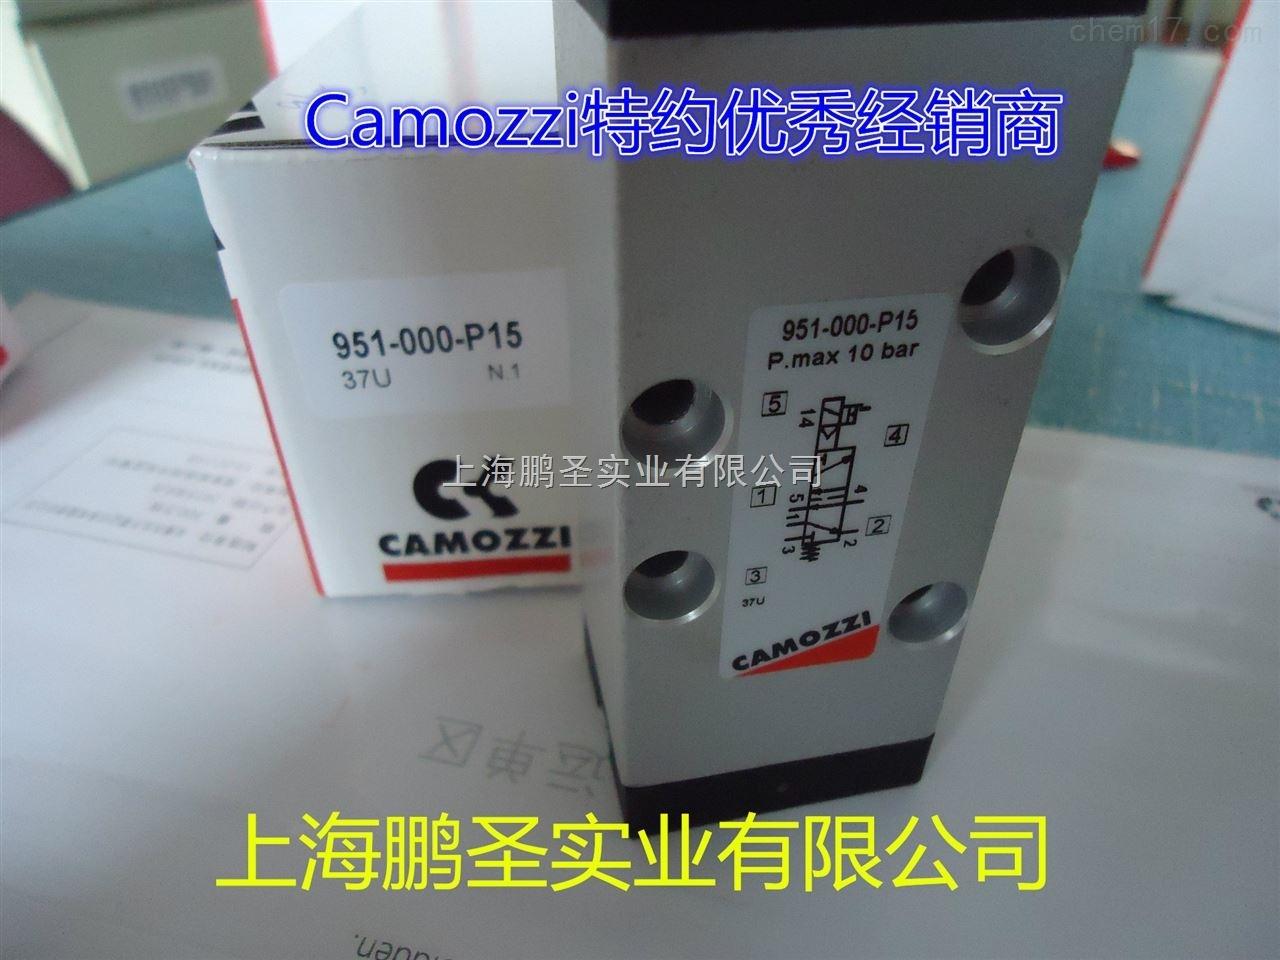 CAMOZZI951-000-P15